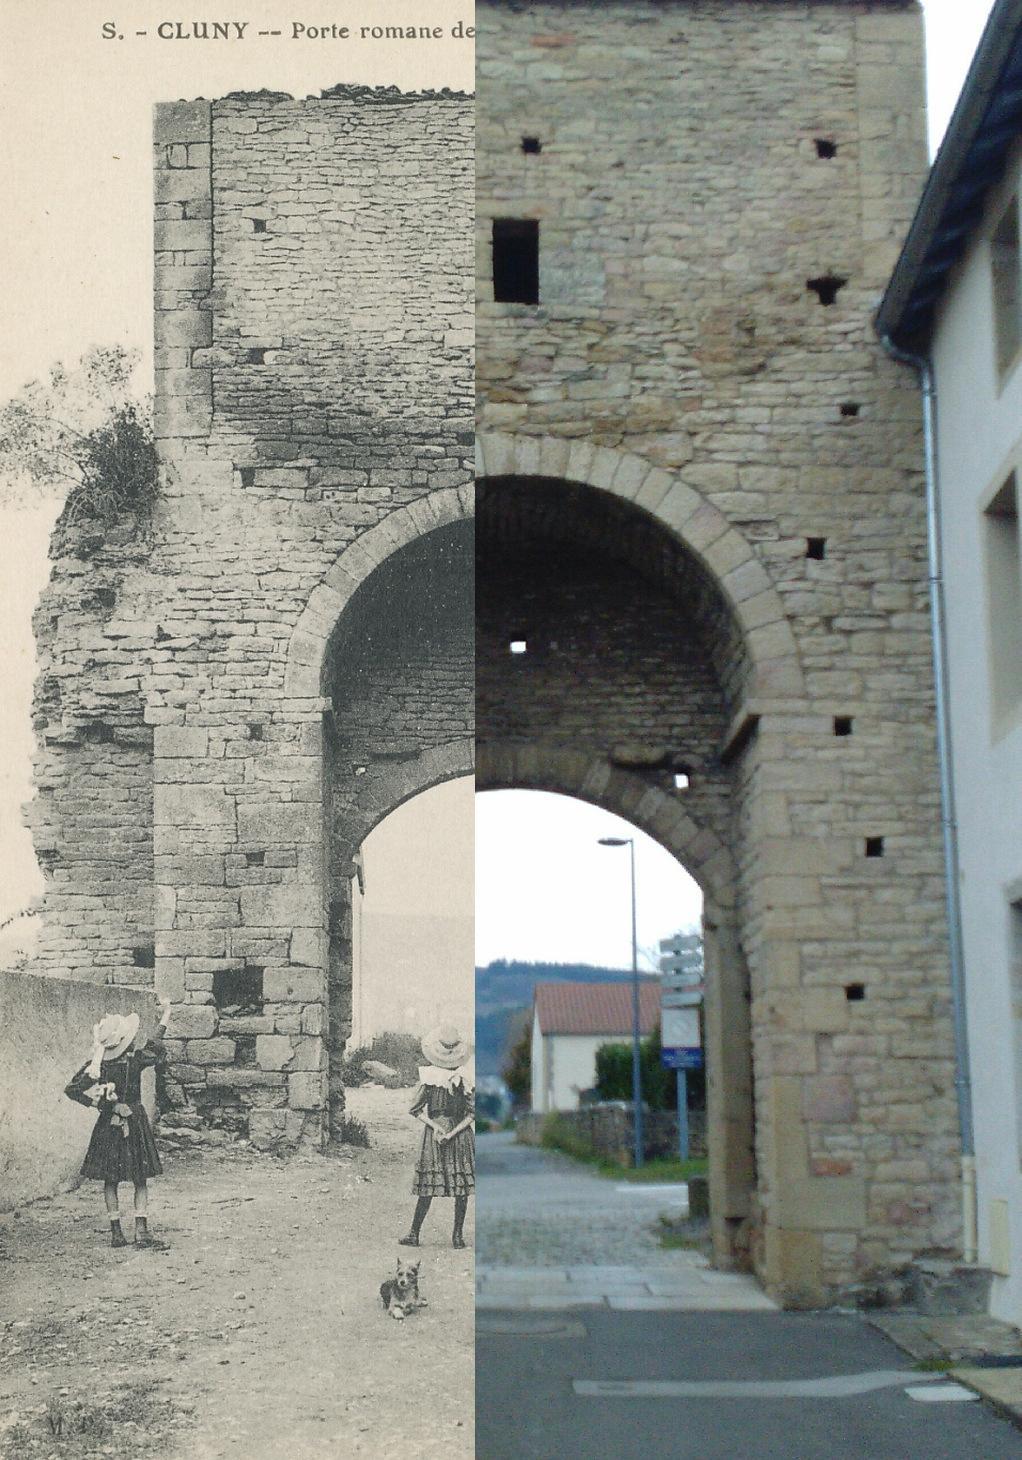 Cluny - Cluny. Porte romane de Saint-Mayeul (XIIe s.).